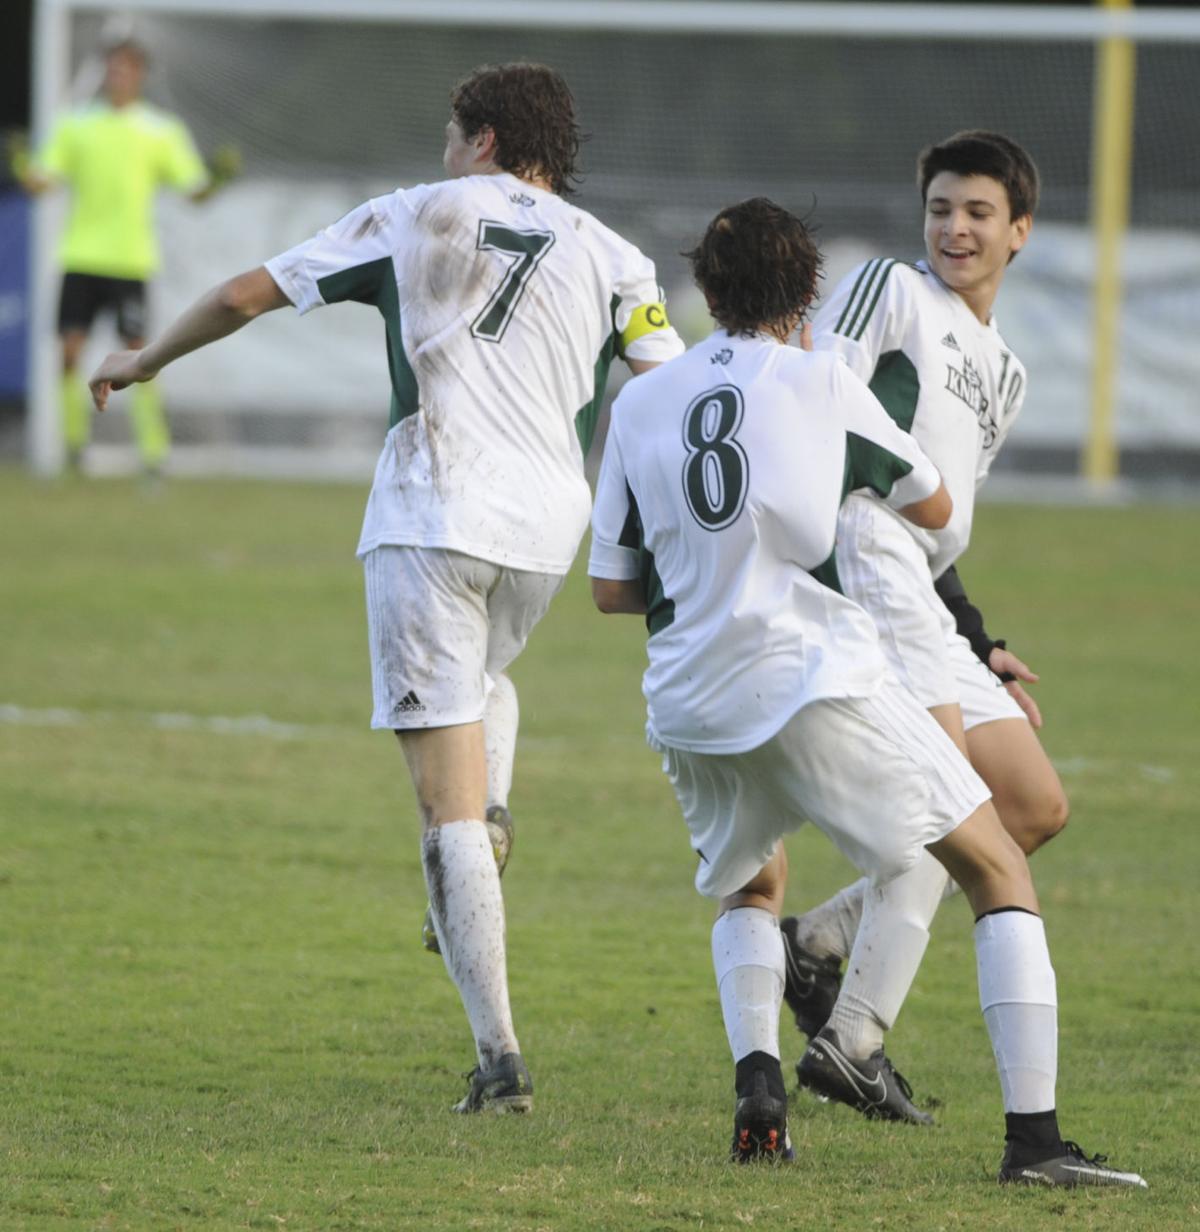 051517_fa boys soccer 7